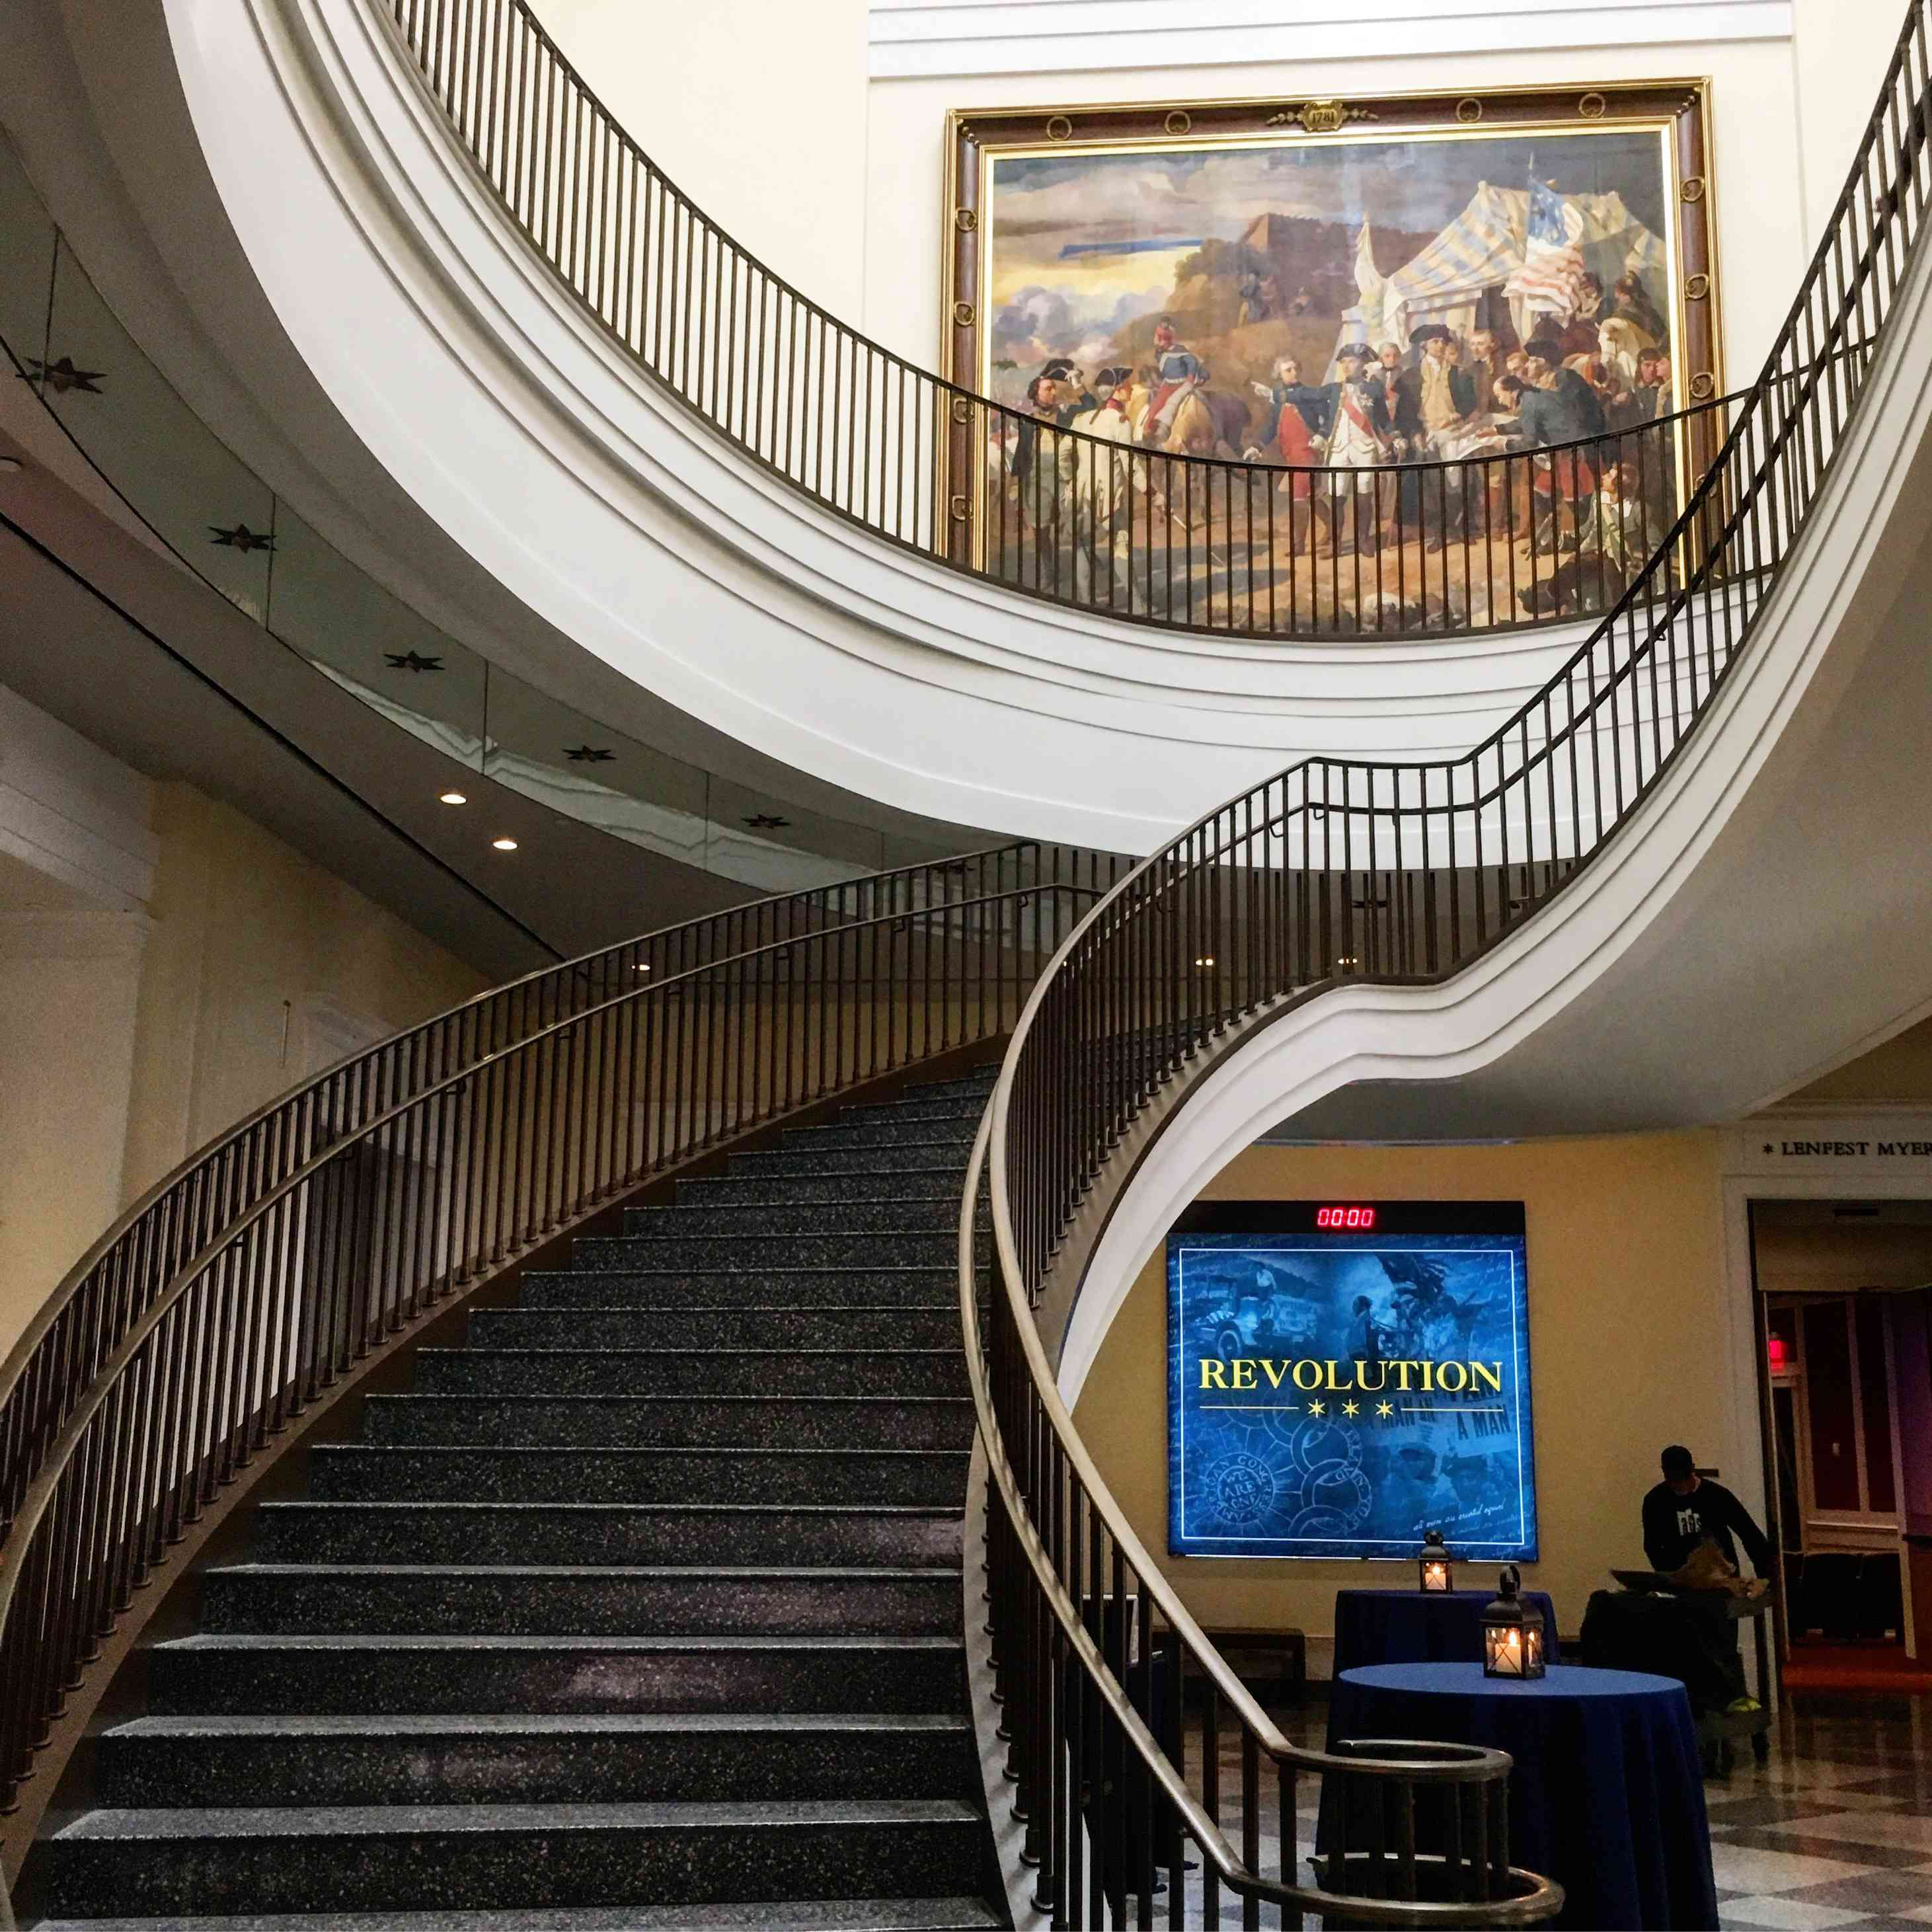 Interior of American Revolution Museum